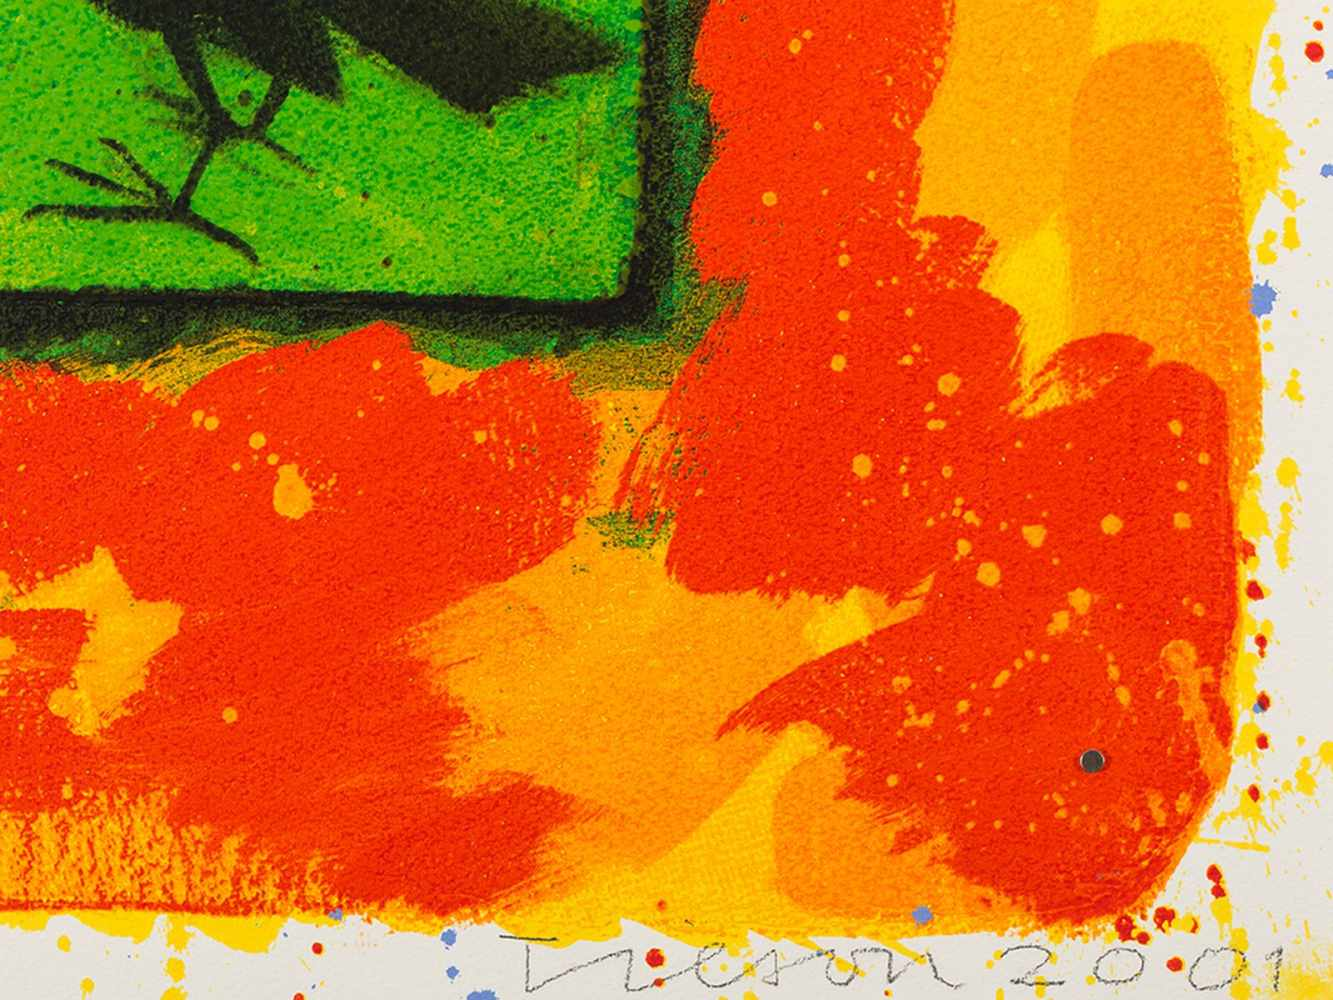 Joe Tilson, Conjunctions, 3 Serigraphs in Colors, 2001 - Image 5 of 7